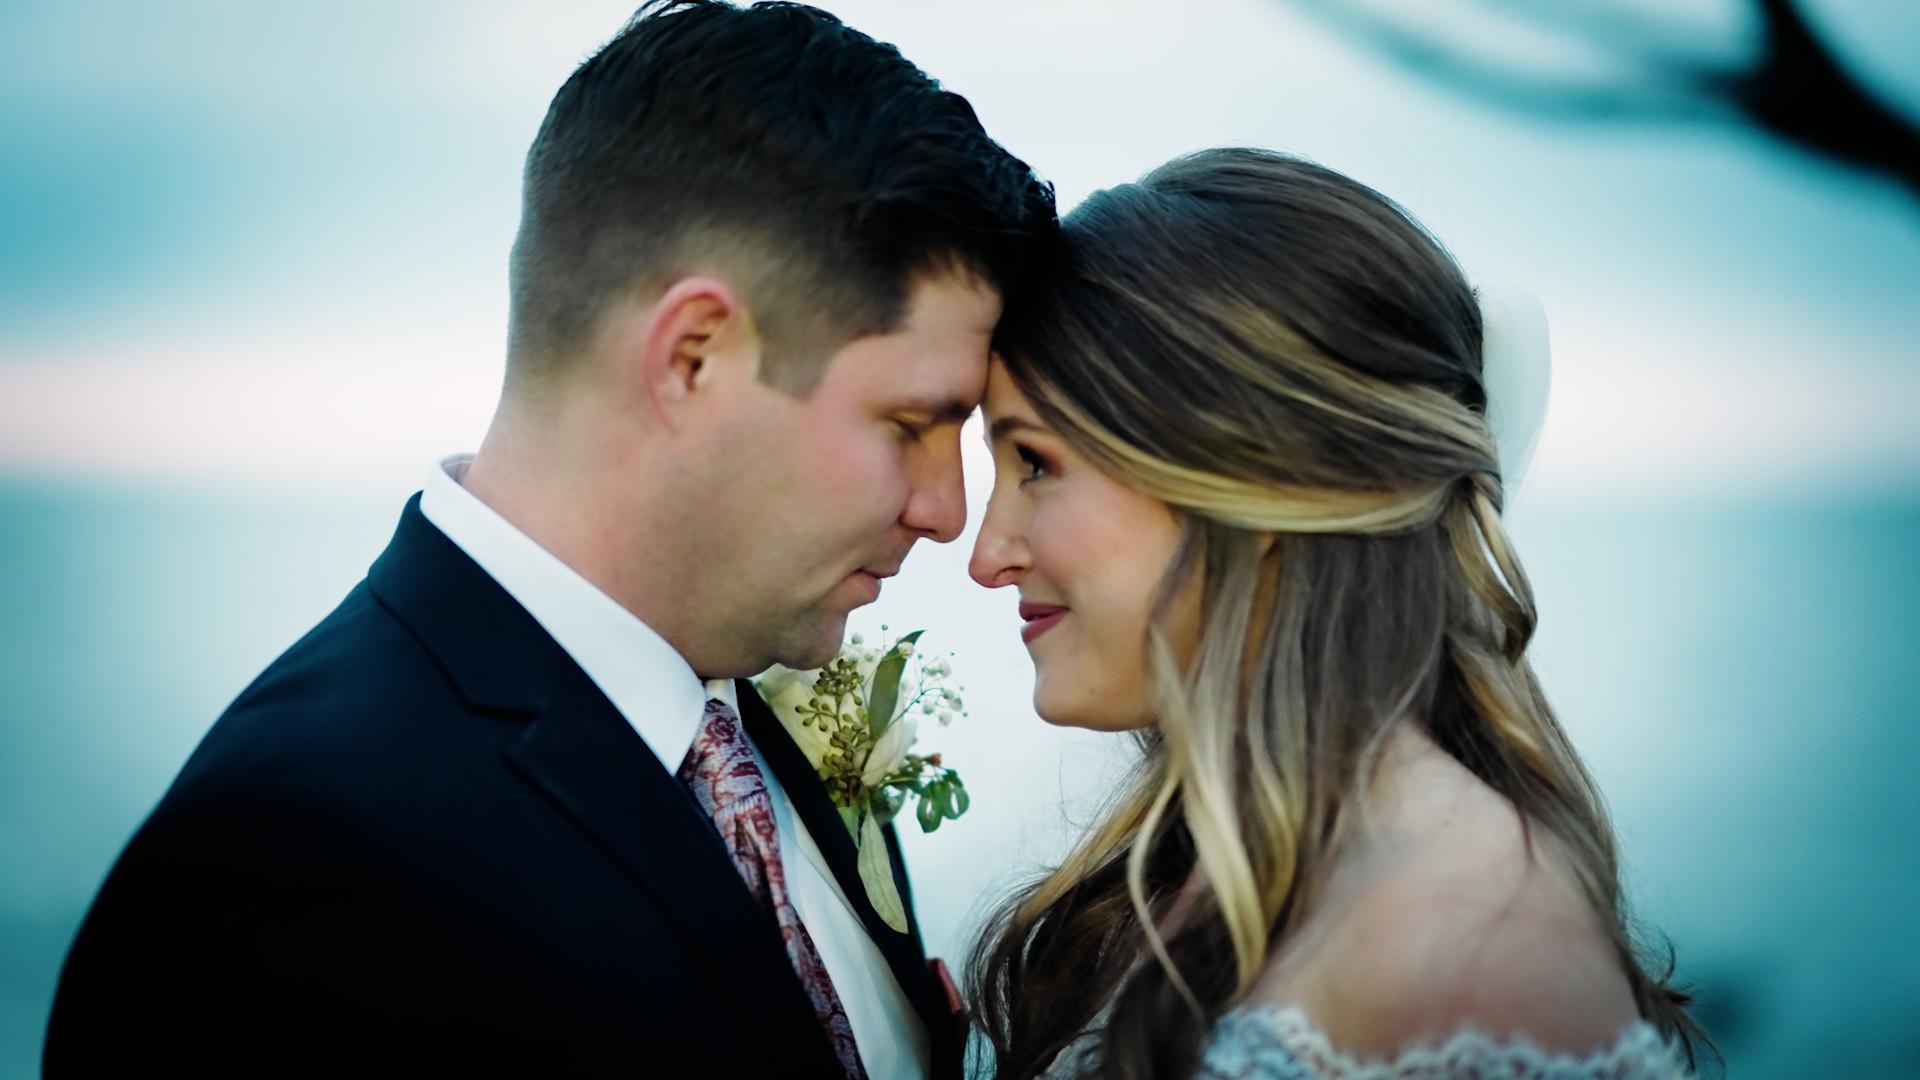 Wedding Videographer, Kind Words